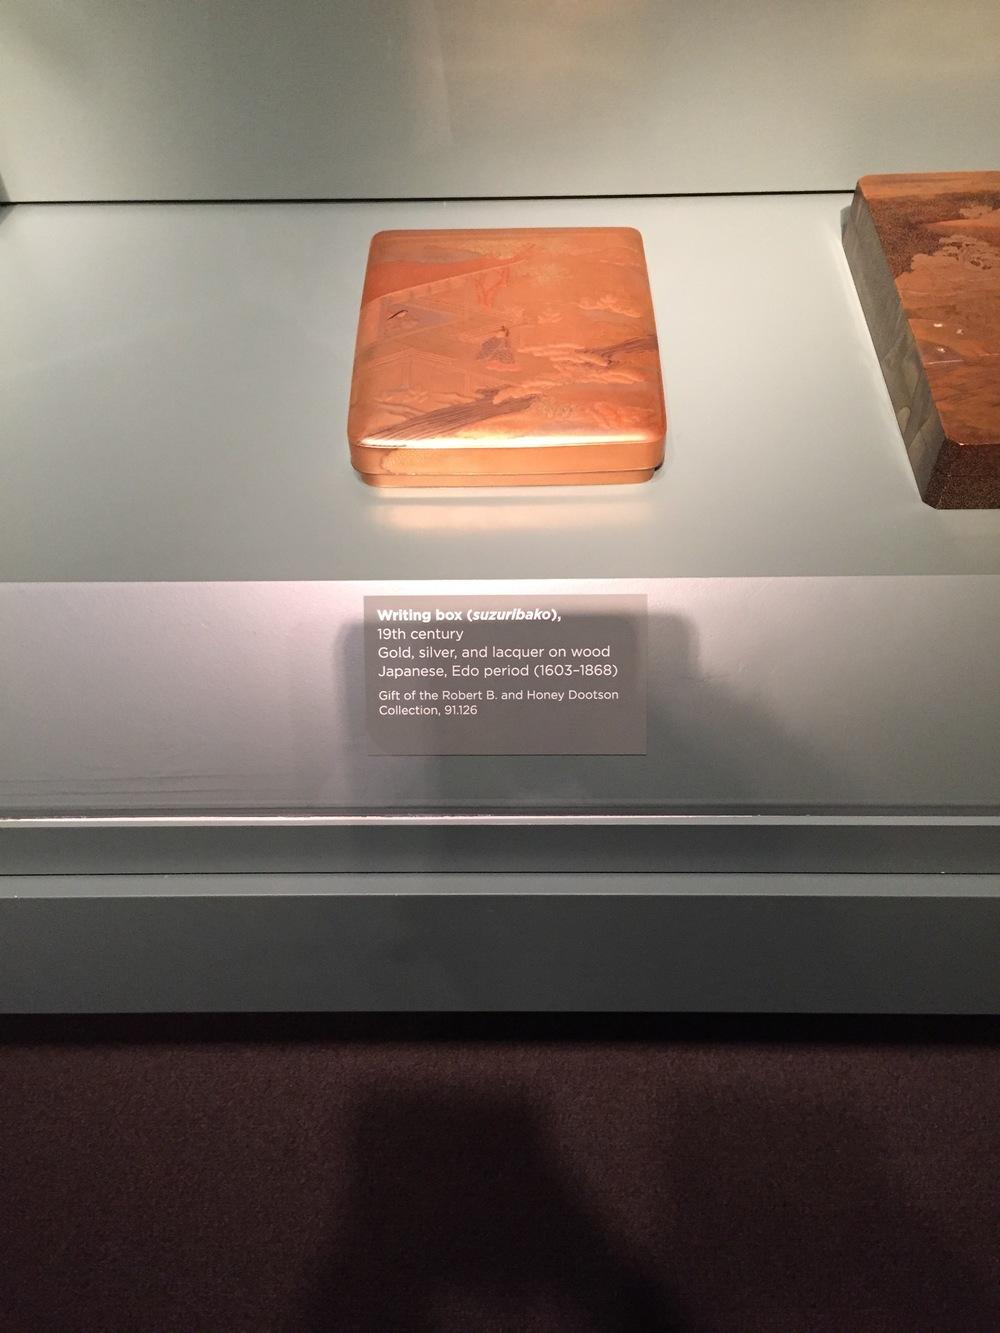 box from 19th century Edo period (1603-1868)